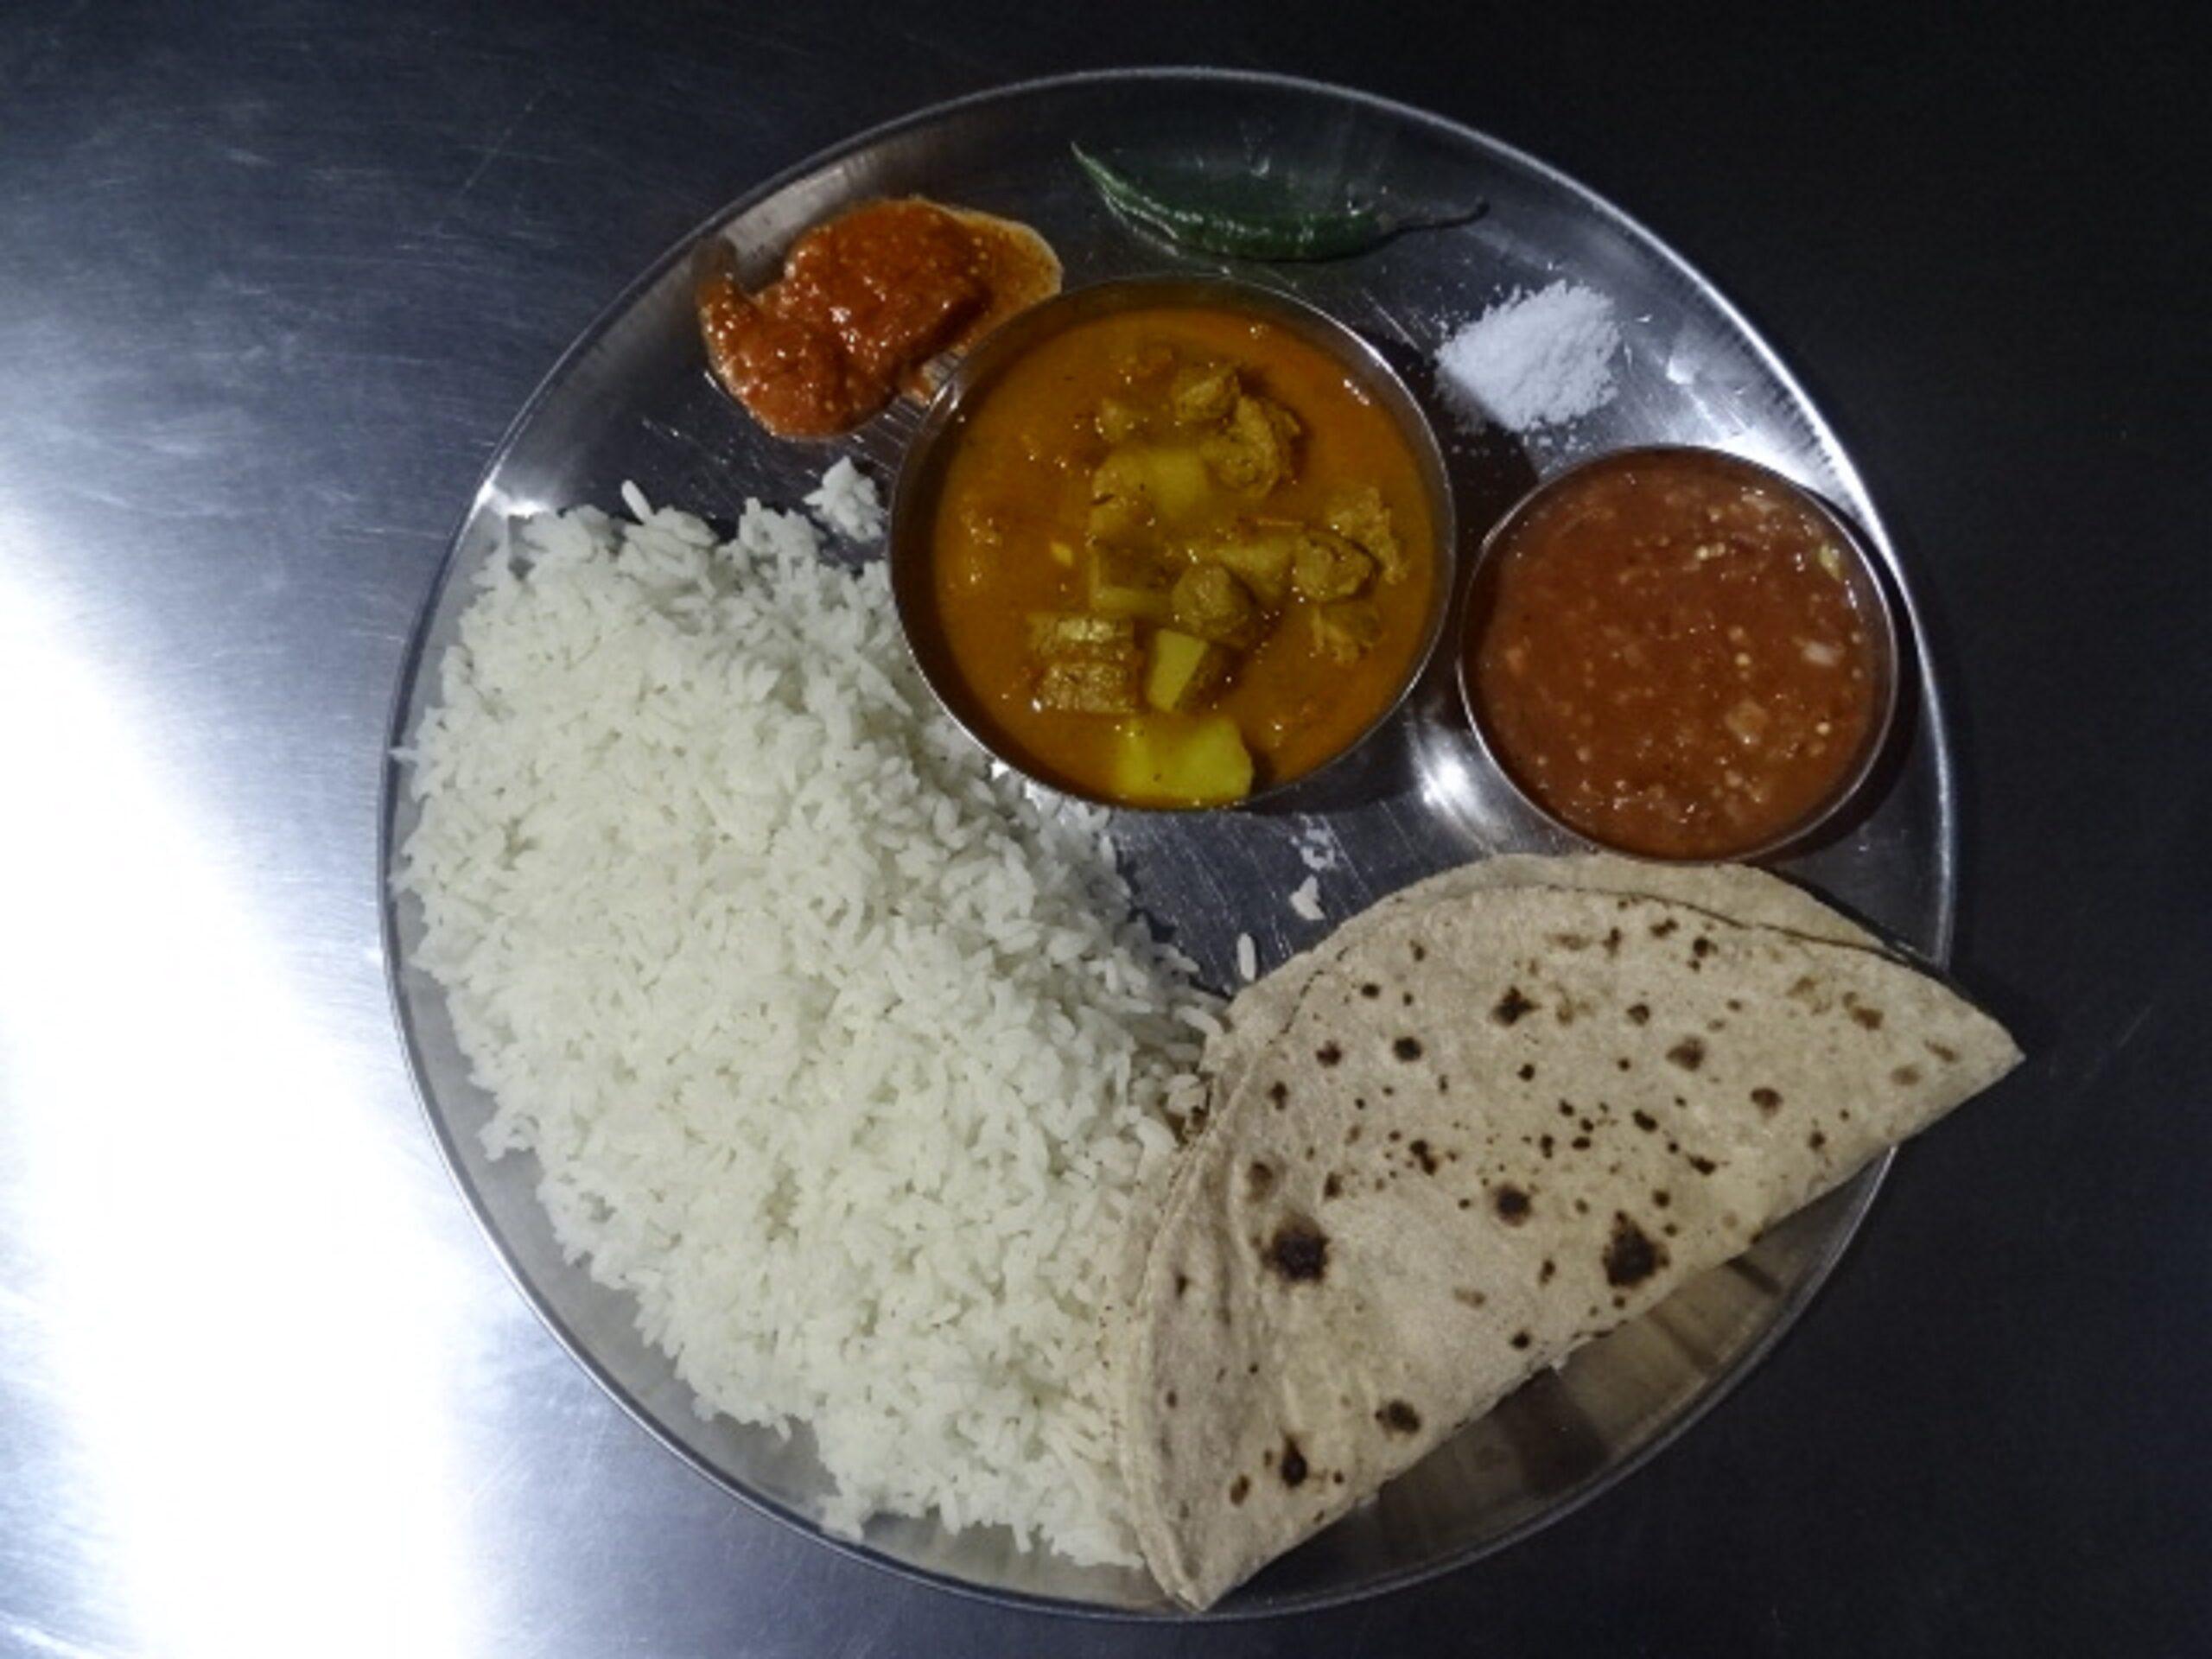 Odisha Food Thali at Hotel Shree Sai Keshav, Shirdi, Maharashtra, India